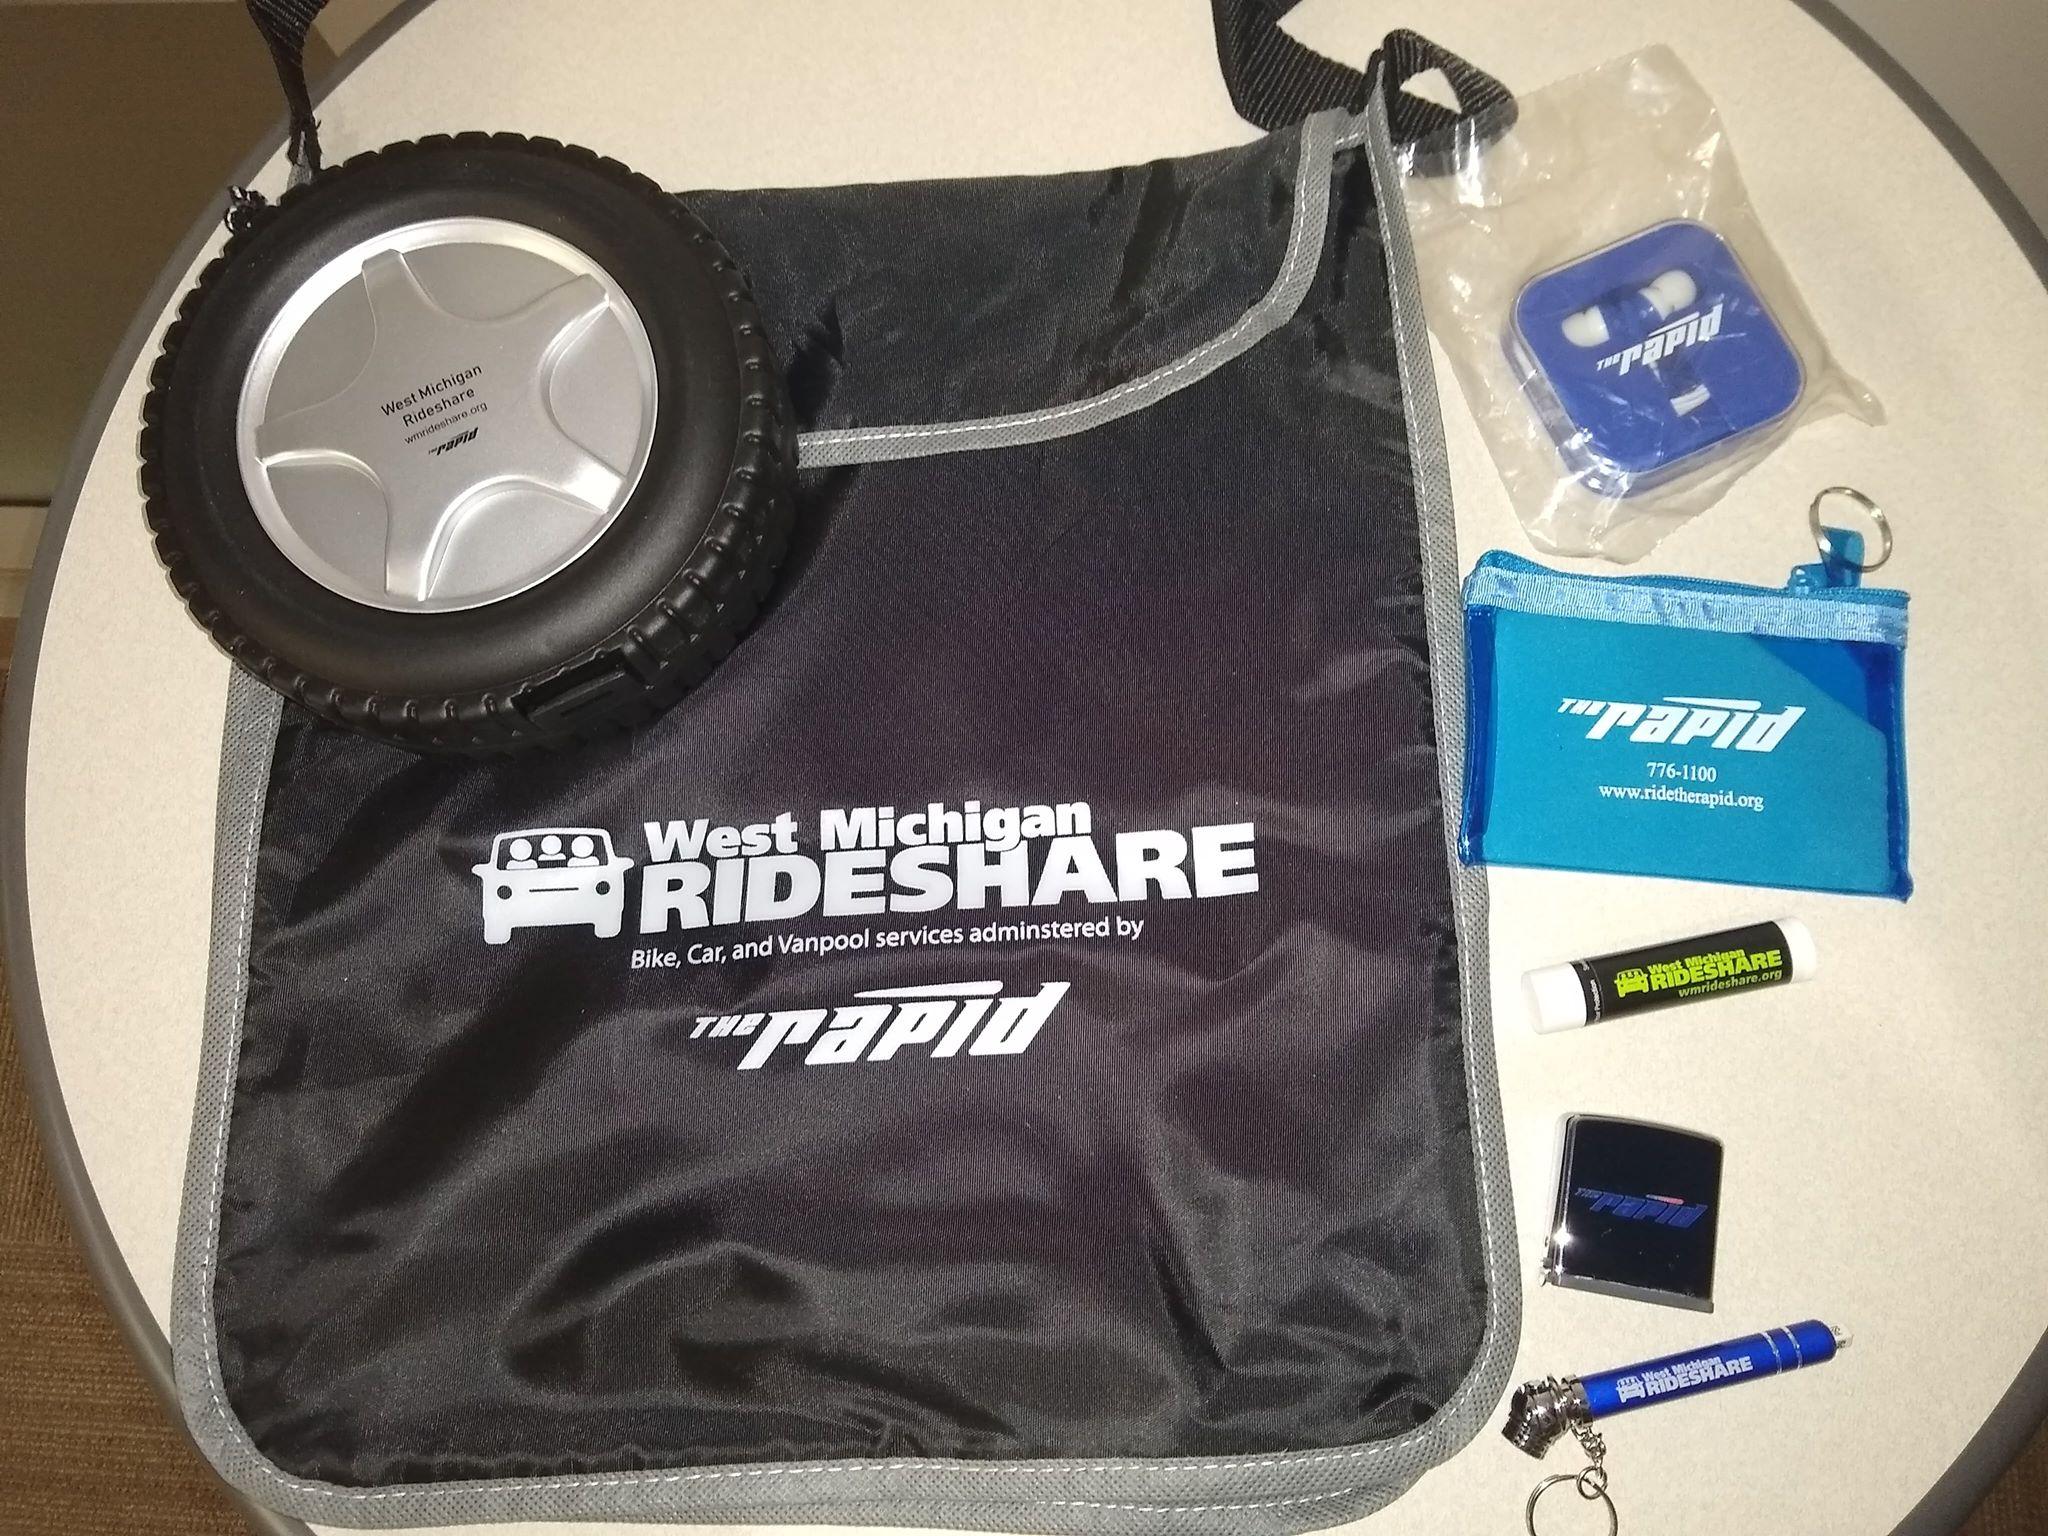 rideshare giveaway1.jpg